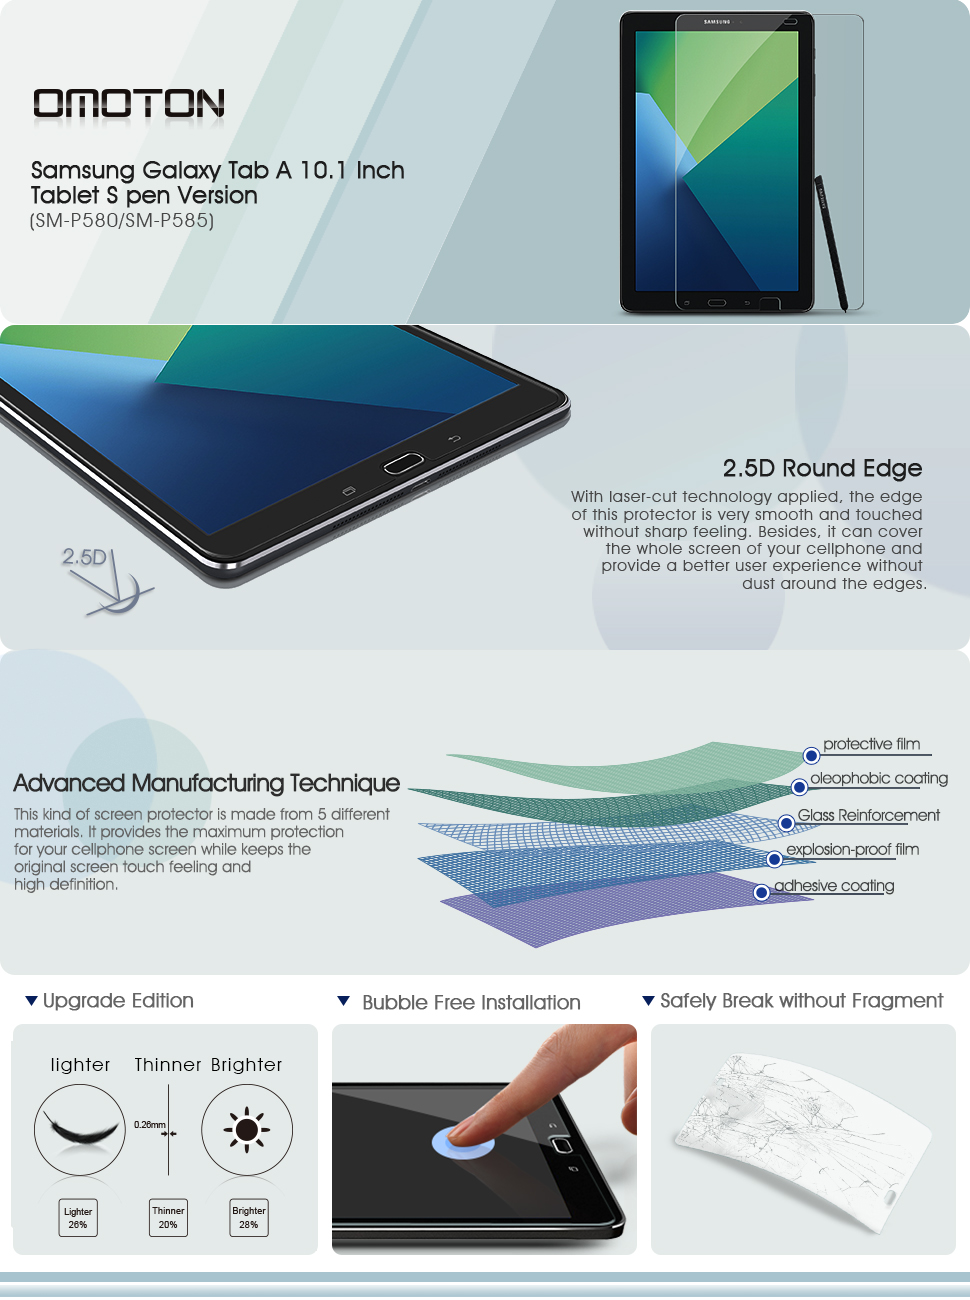 samsung galaxy tab 2 10.1 inch tablet user manual